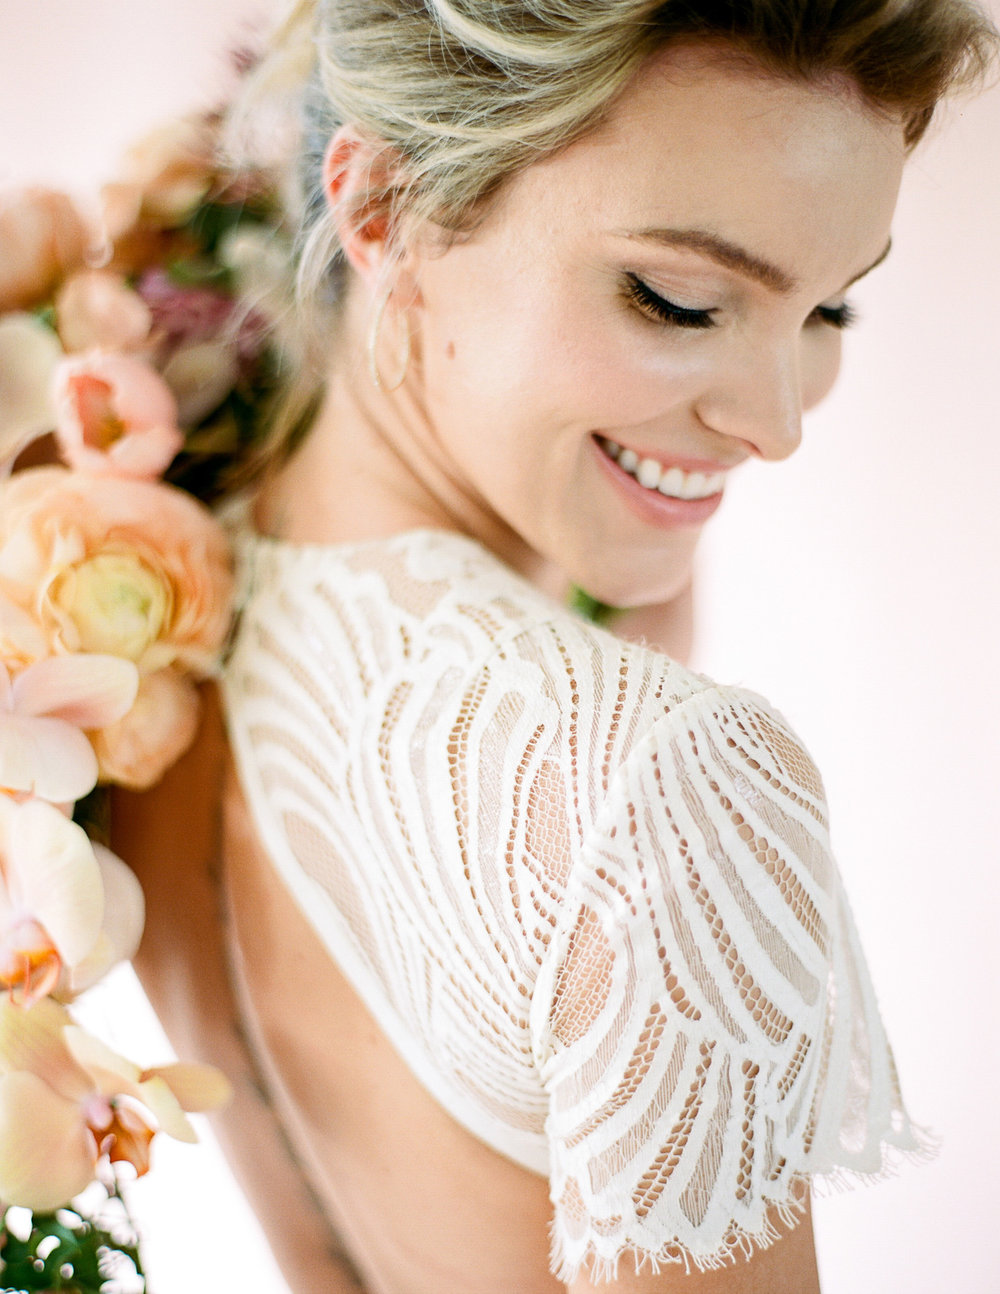 Austin-Wedding-Photography-Prospect-House-Fine-Art-Film-Destination-Dana-Josh-Fernandez-Photography-Dallas-Houston-Luxury-Best-Top-203.jpg